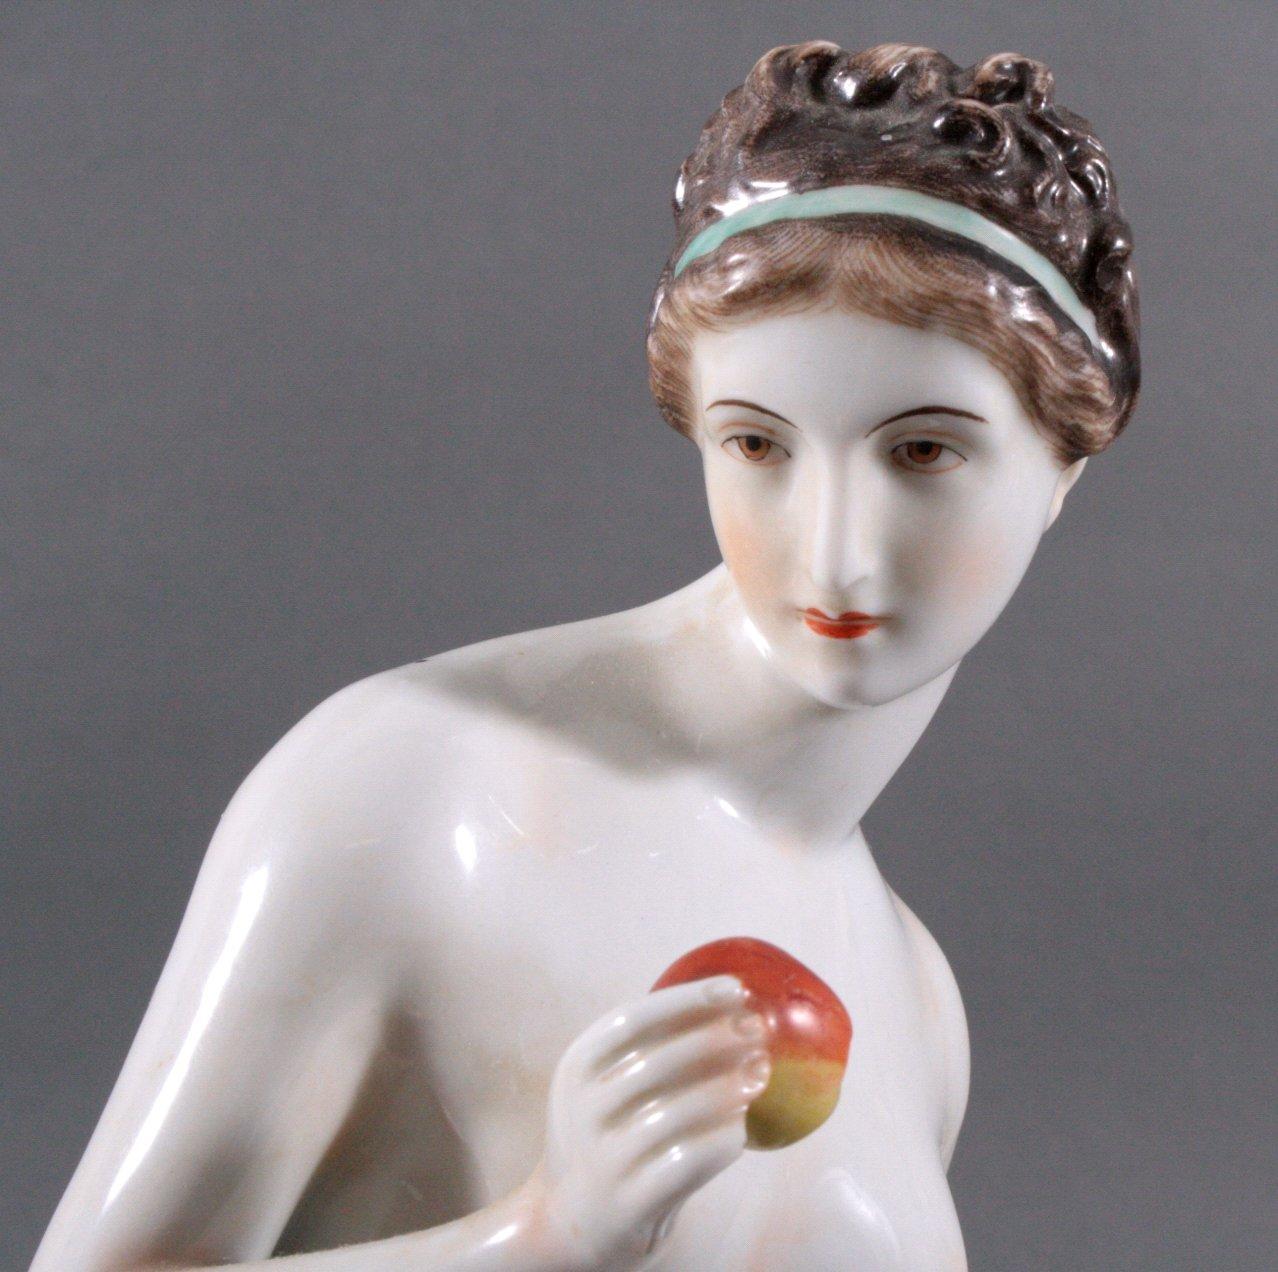 Porzellan-Skulptur, Aelteste Vokstedter-4